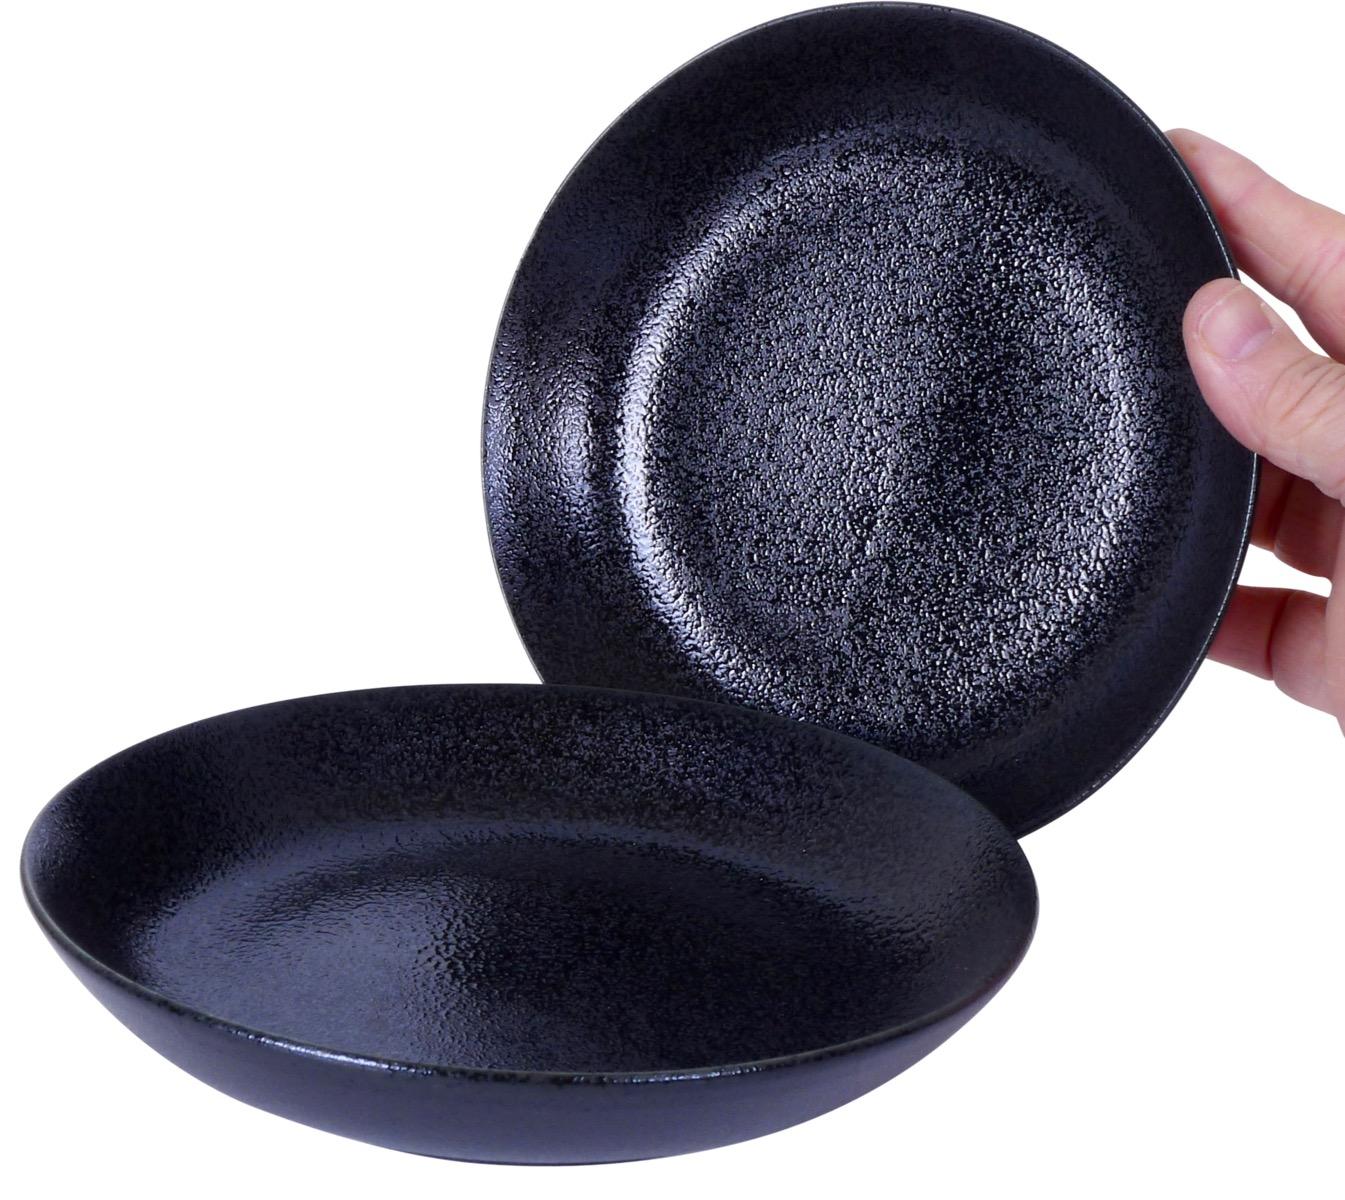 Image of Stoneware Black Bowl 7.5-Inch